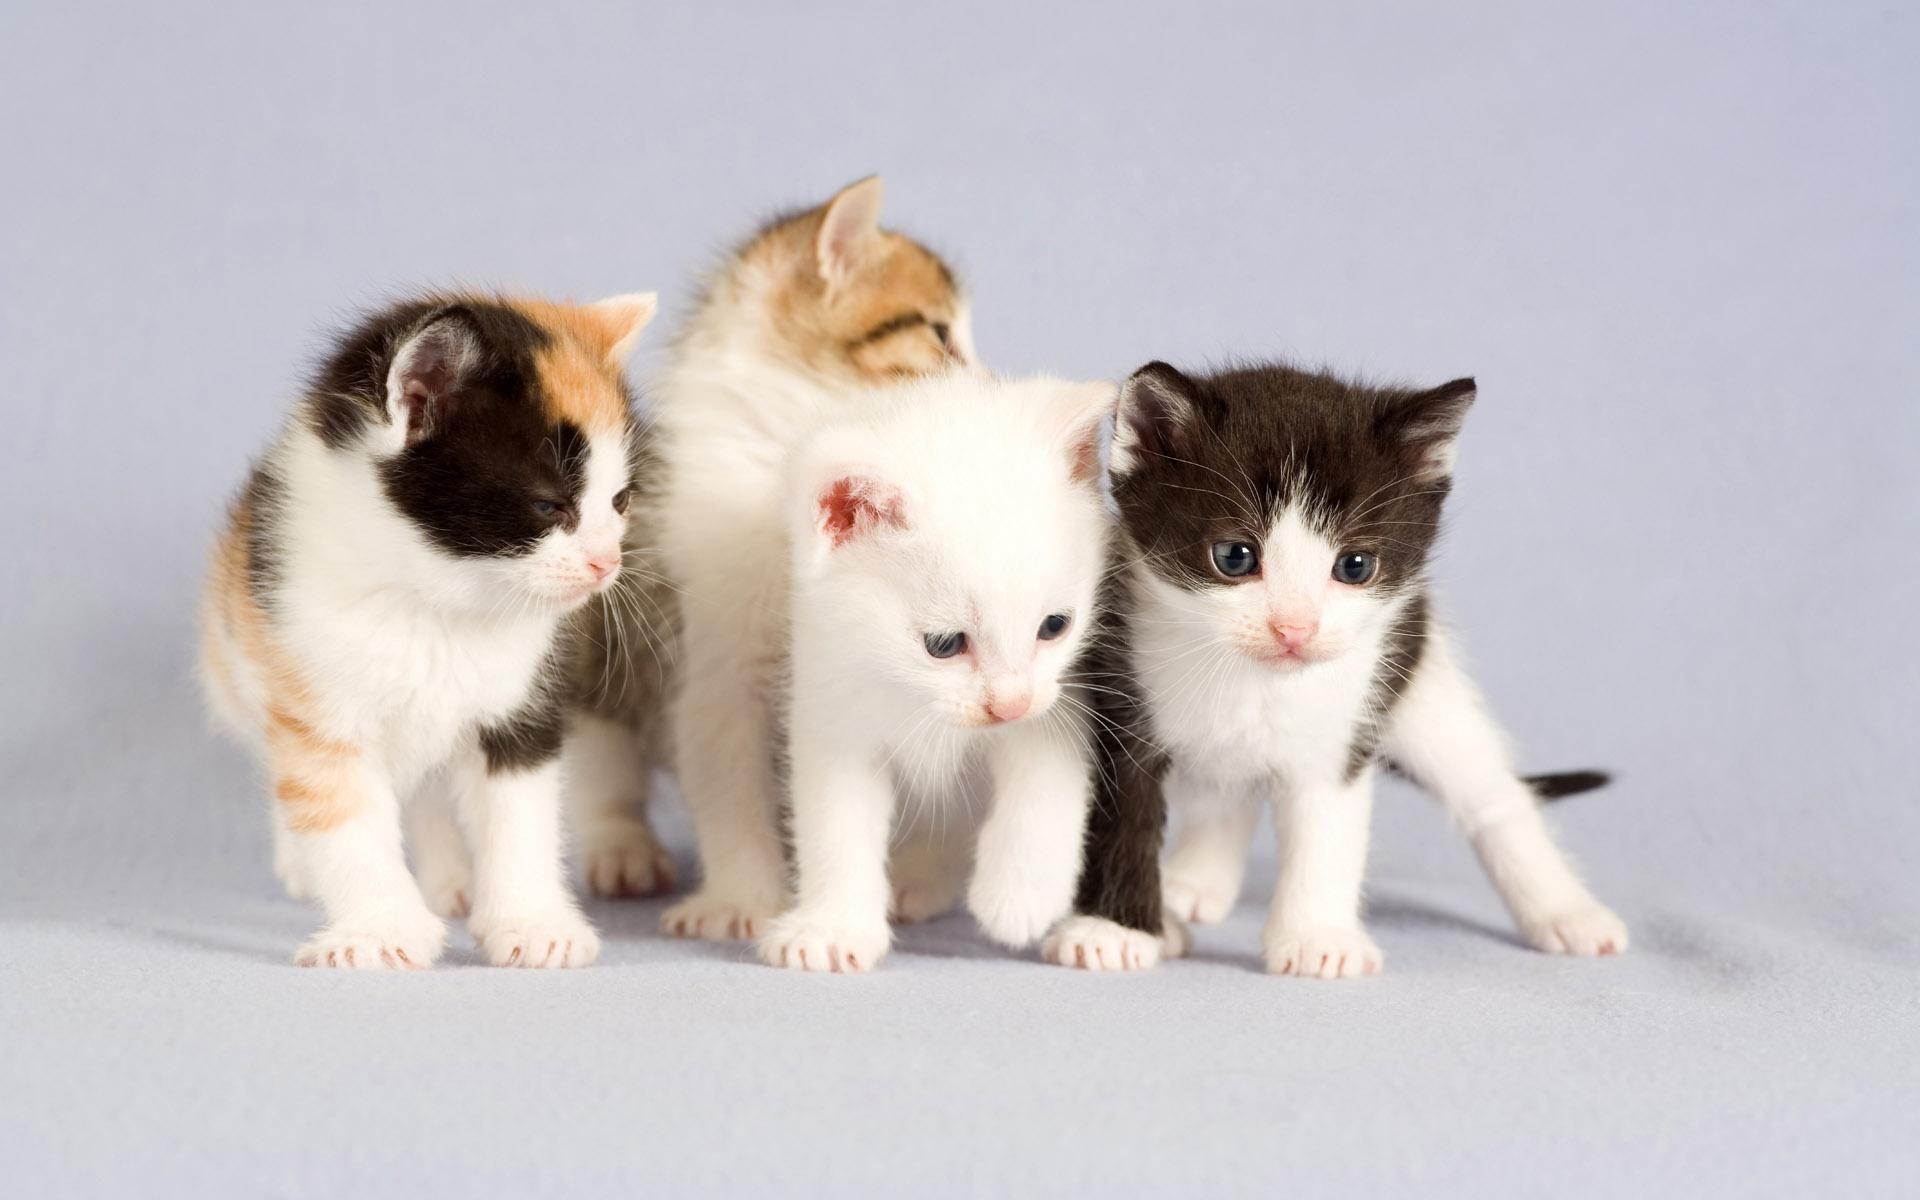 Hd Cat Wallpapers 1920x1080 69 Images: 【桌面佈景】貓咪桌布分享(38張) @ ♂月橘館♀ :: 痞客邦